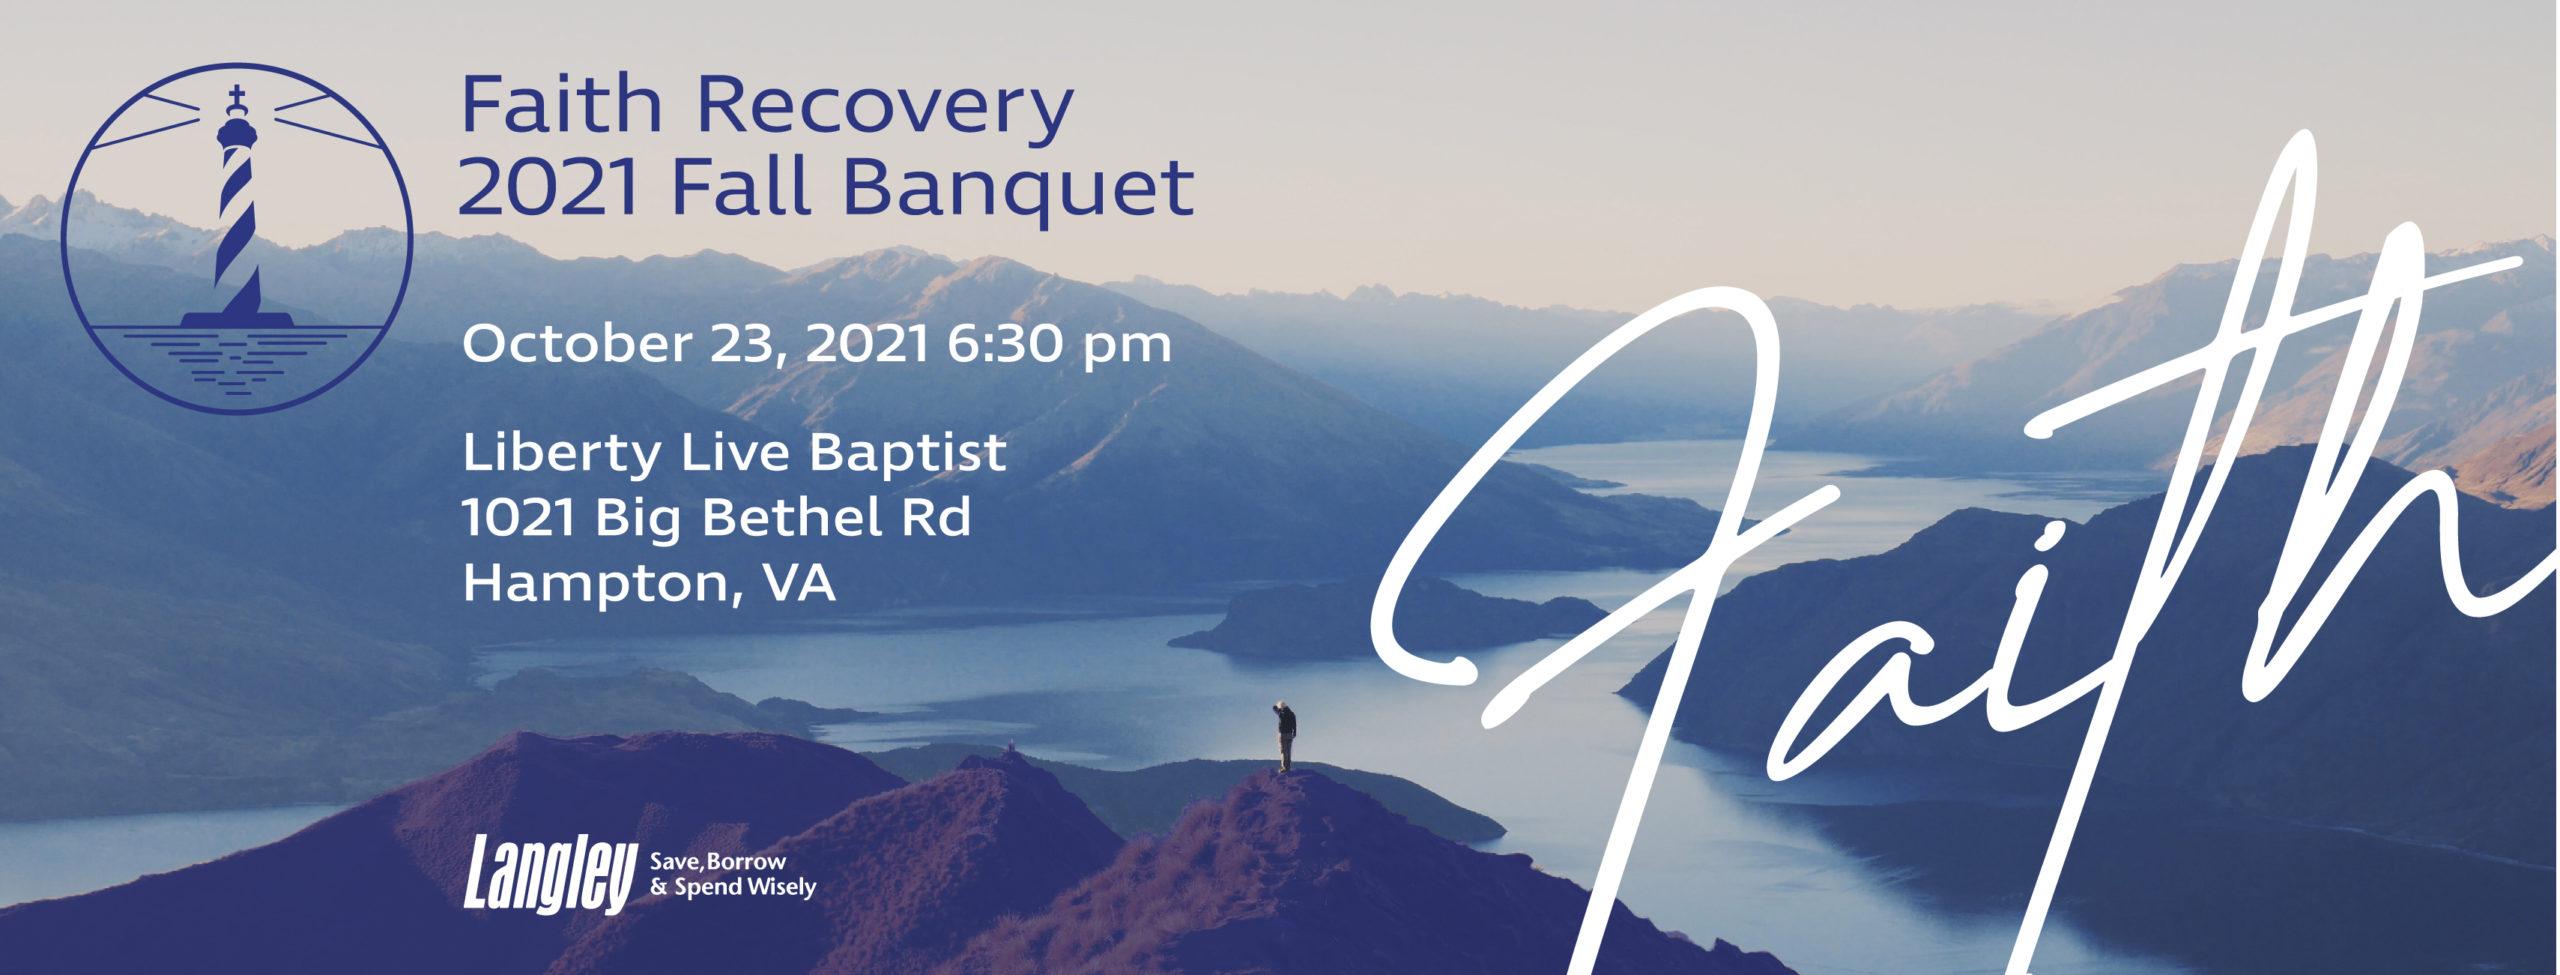 Faith Recovery 2021 Fall Banquet_Facebook Cover